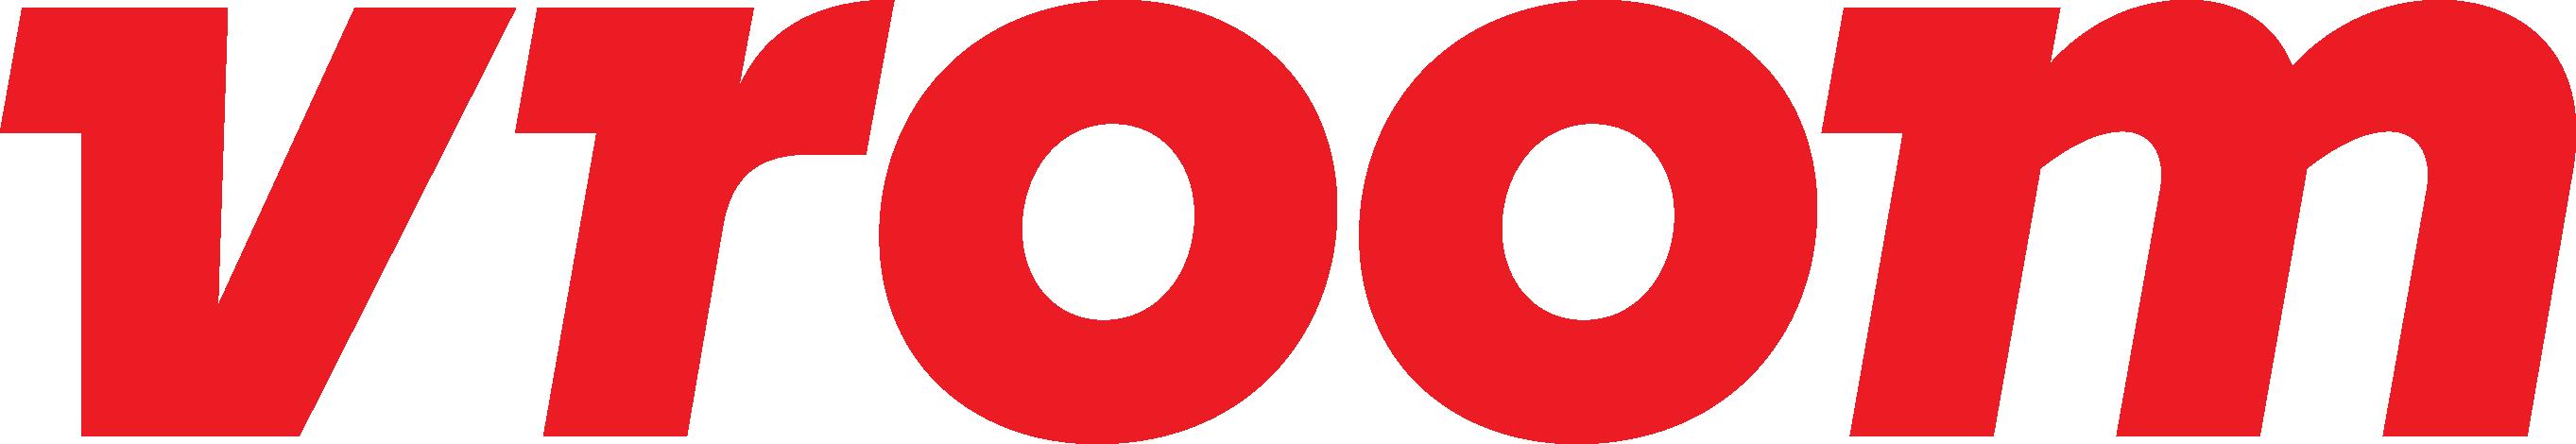 Vroom logo.